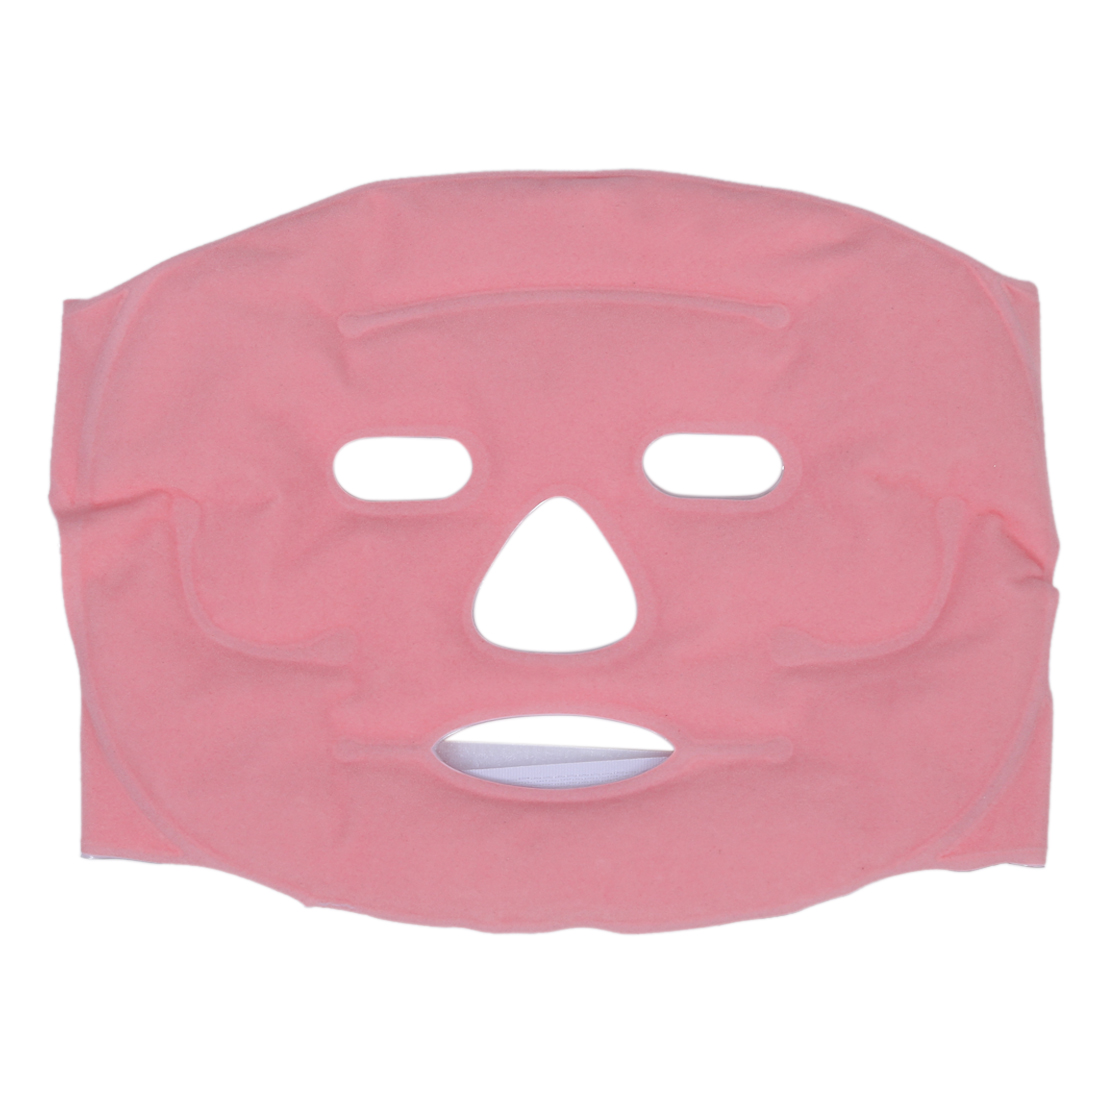 HTHL-Hotsale Tourmaline Gel Slim Face Facial Beauty Mask Facemask Health Care Pink